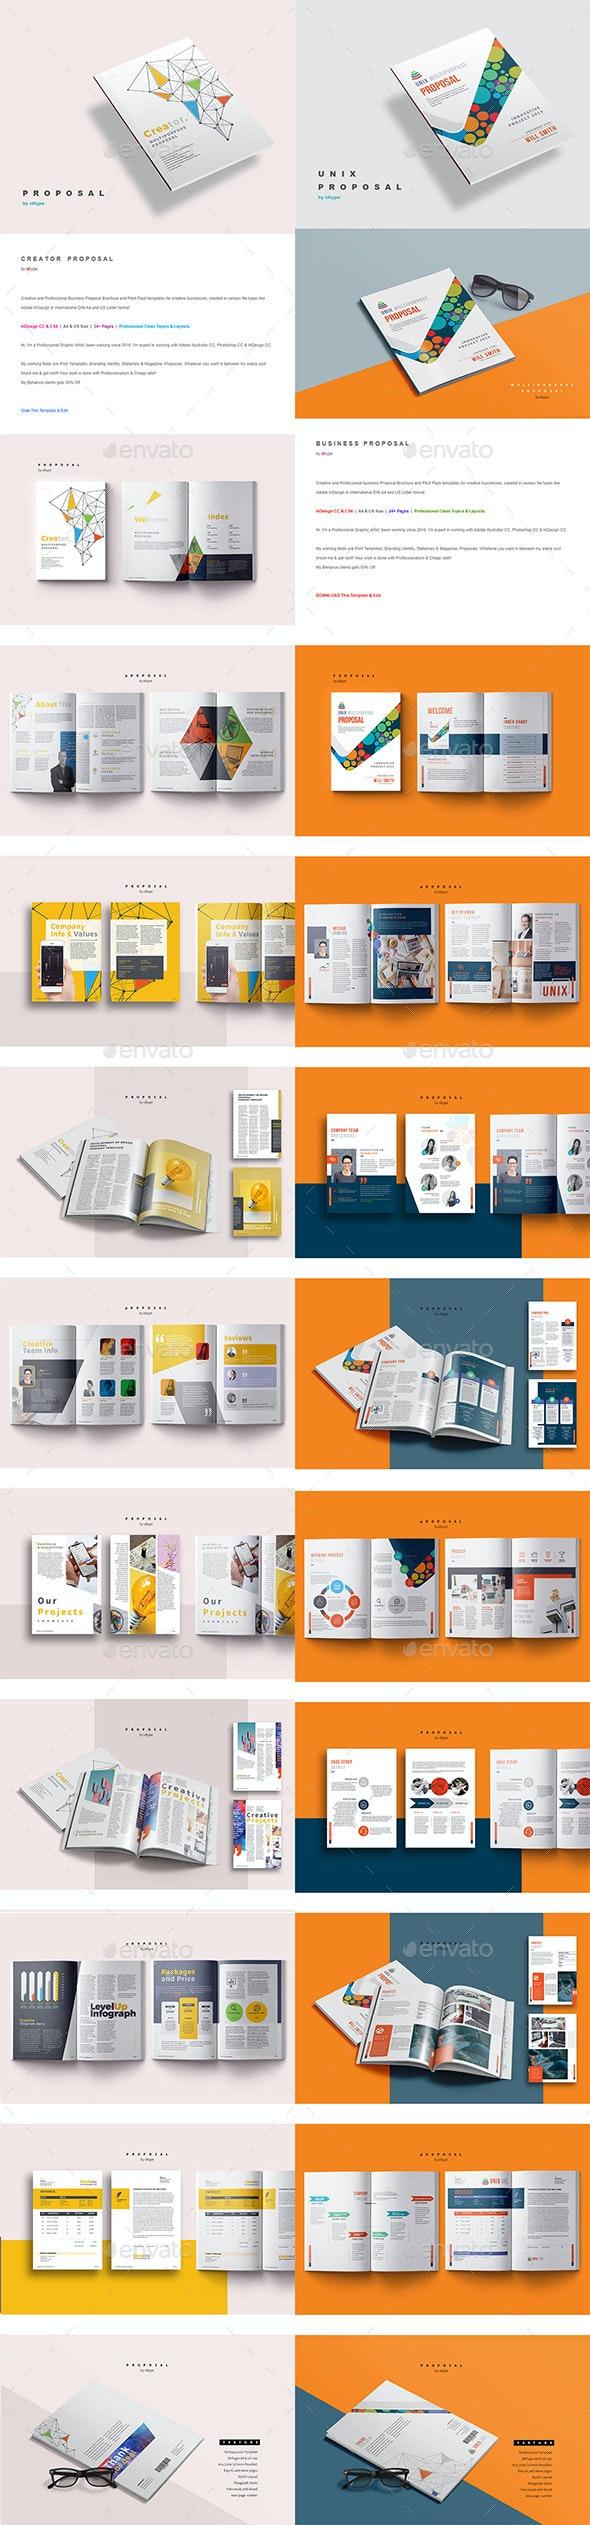 Proposals Bundle - Proposals & Invoices Stationery